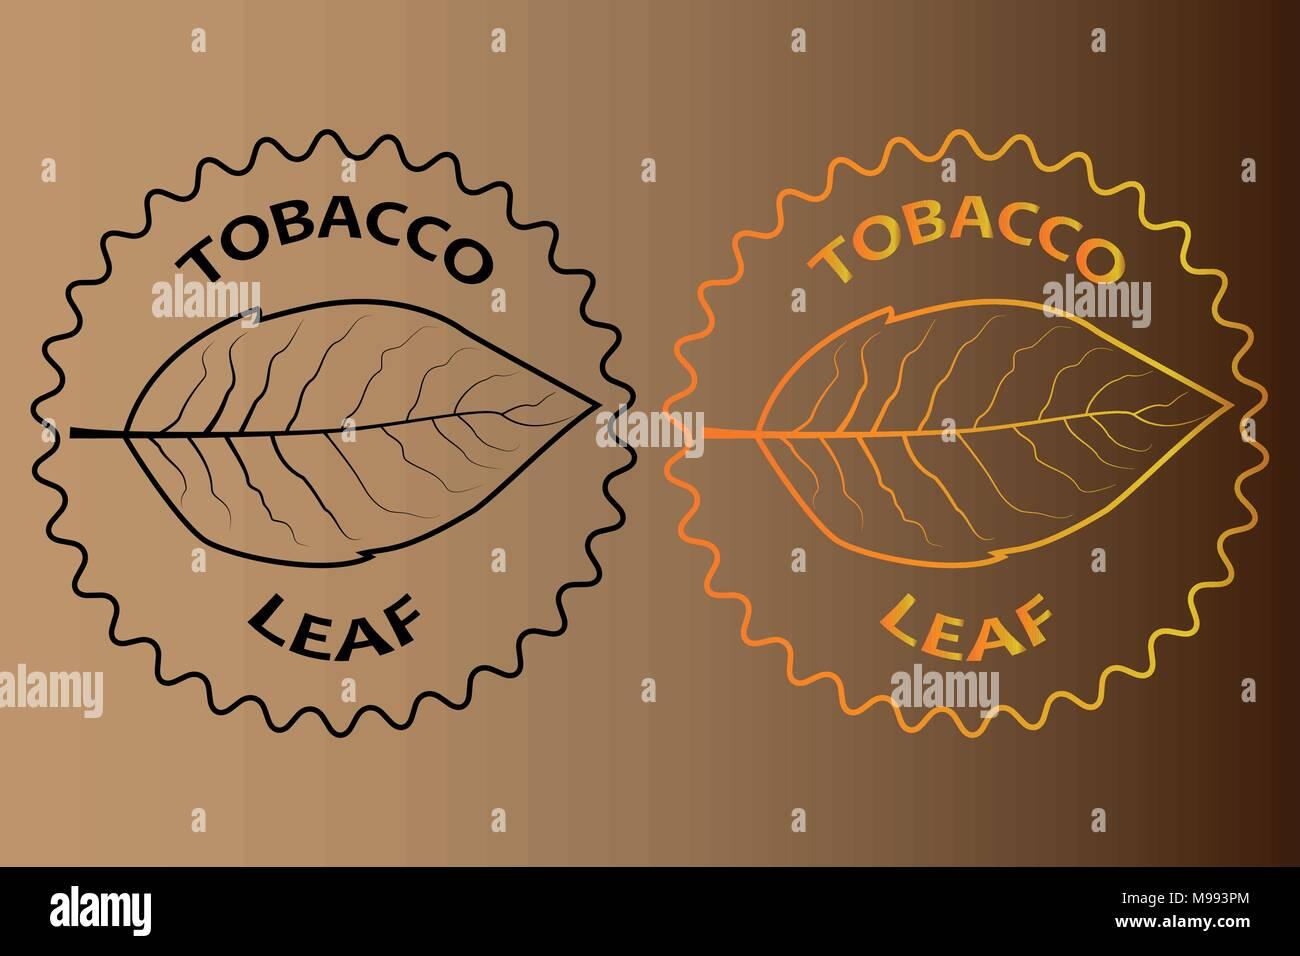 tobacco leaf sticker - vector illustration - Stock Vector